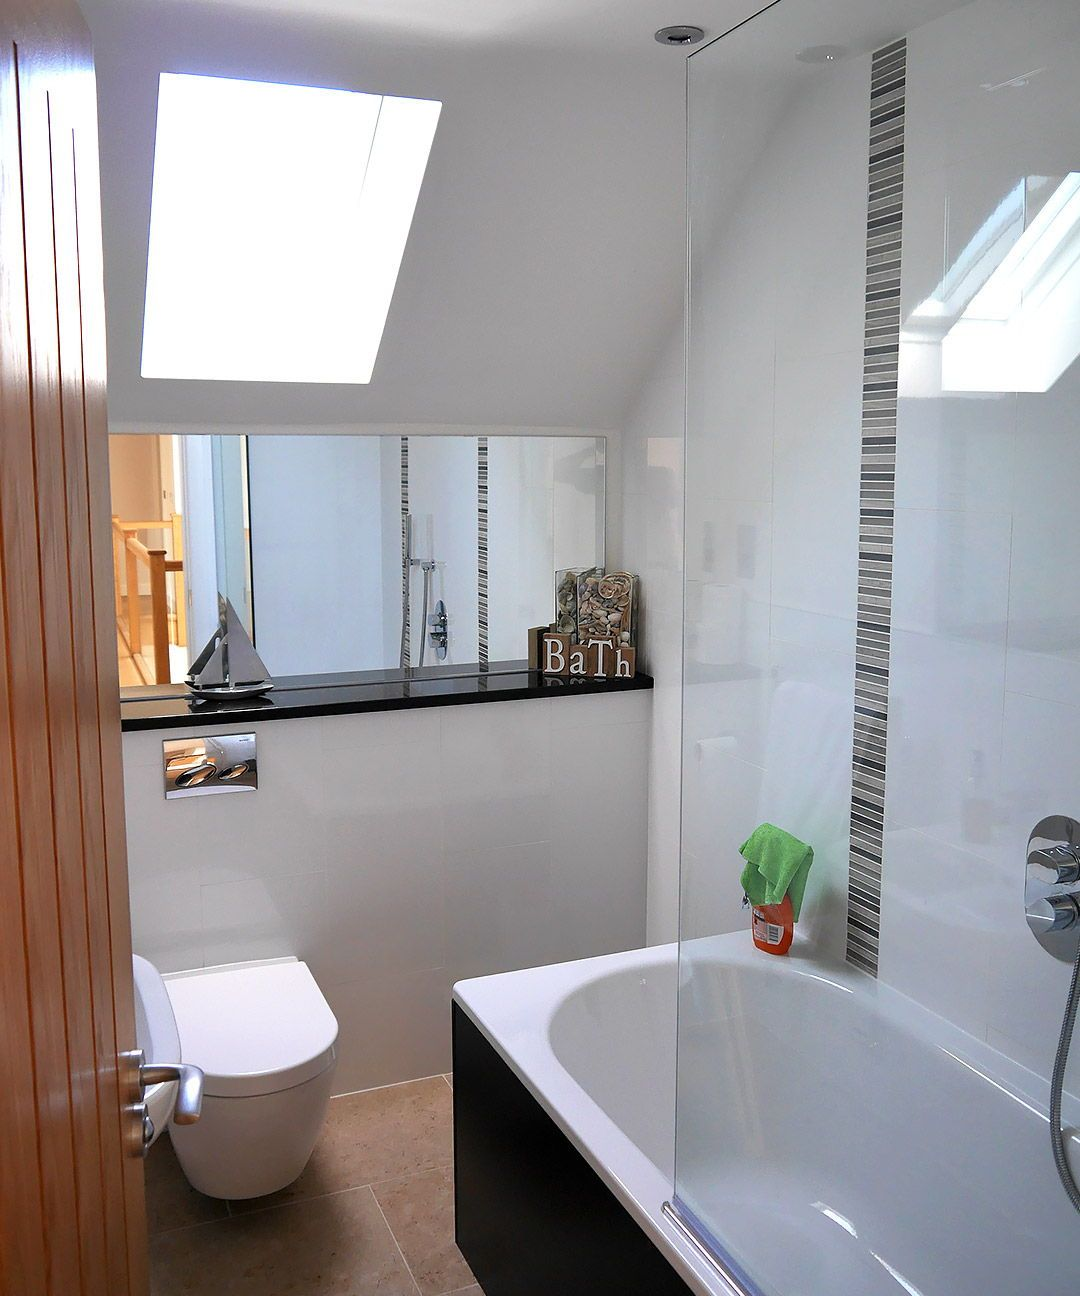 Bathroom Ideas. Contemporary house design with a ...